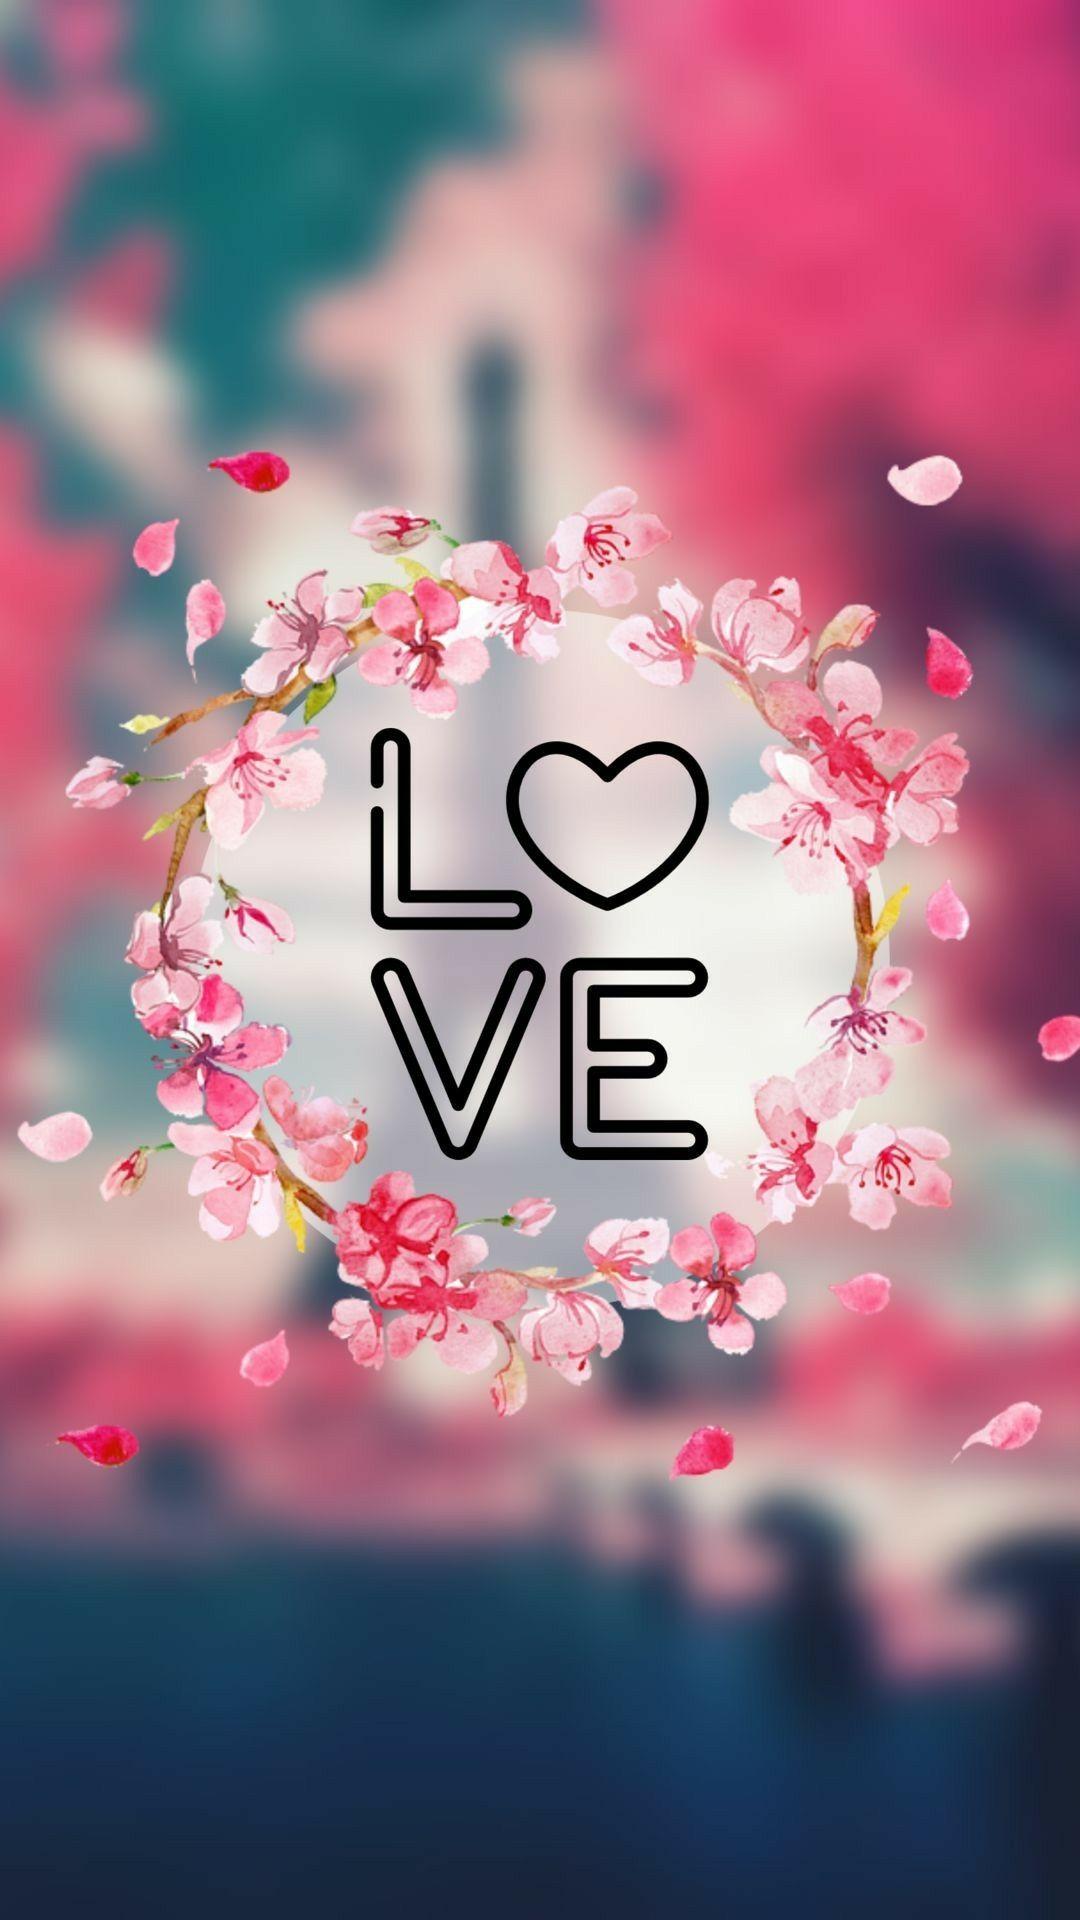 Pin By Faramarz K On Amor Love Wallpaper Pink Wallpaper Iphone Wallpaper